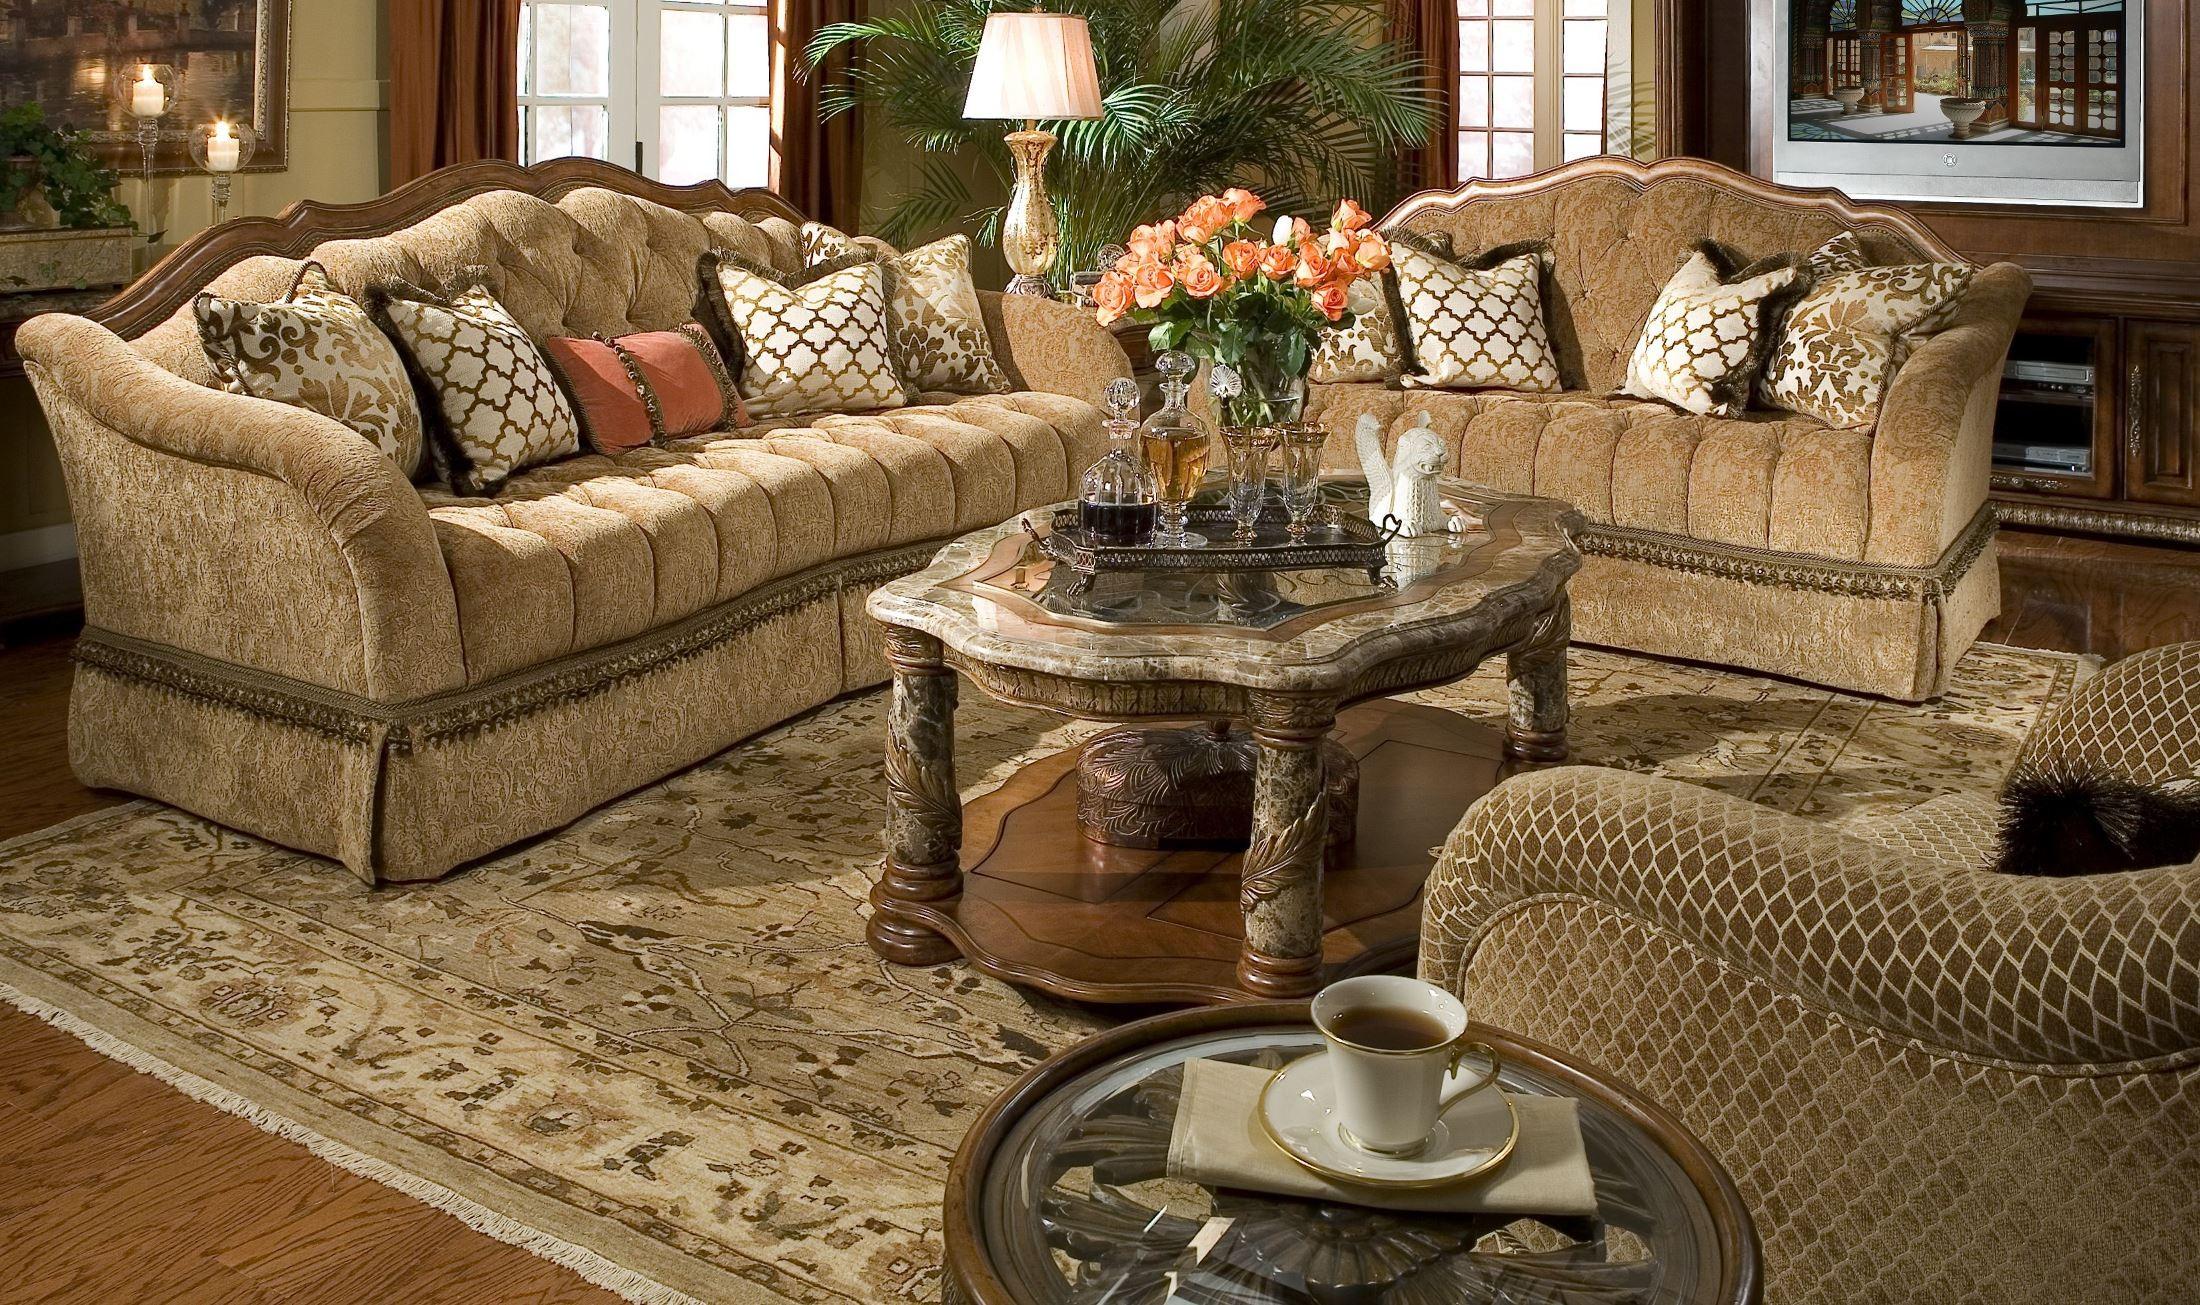 Villa valencia living room set from aico 72815 coleman furniture for Aico furniture living room set